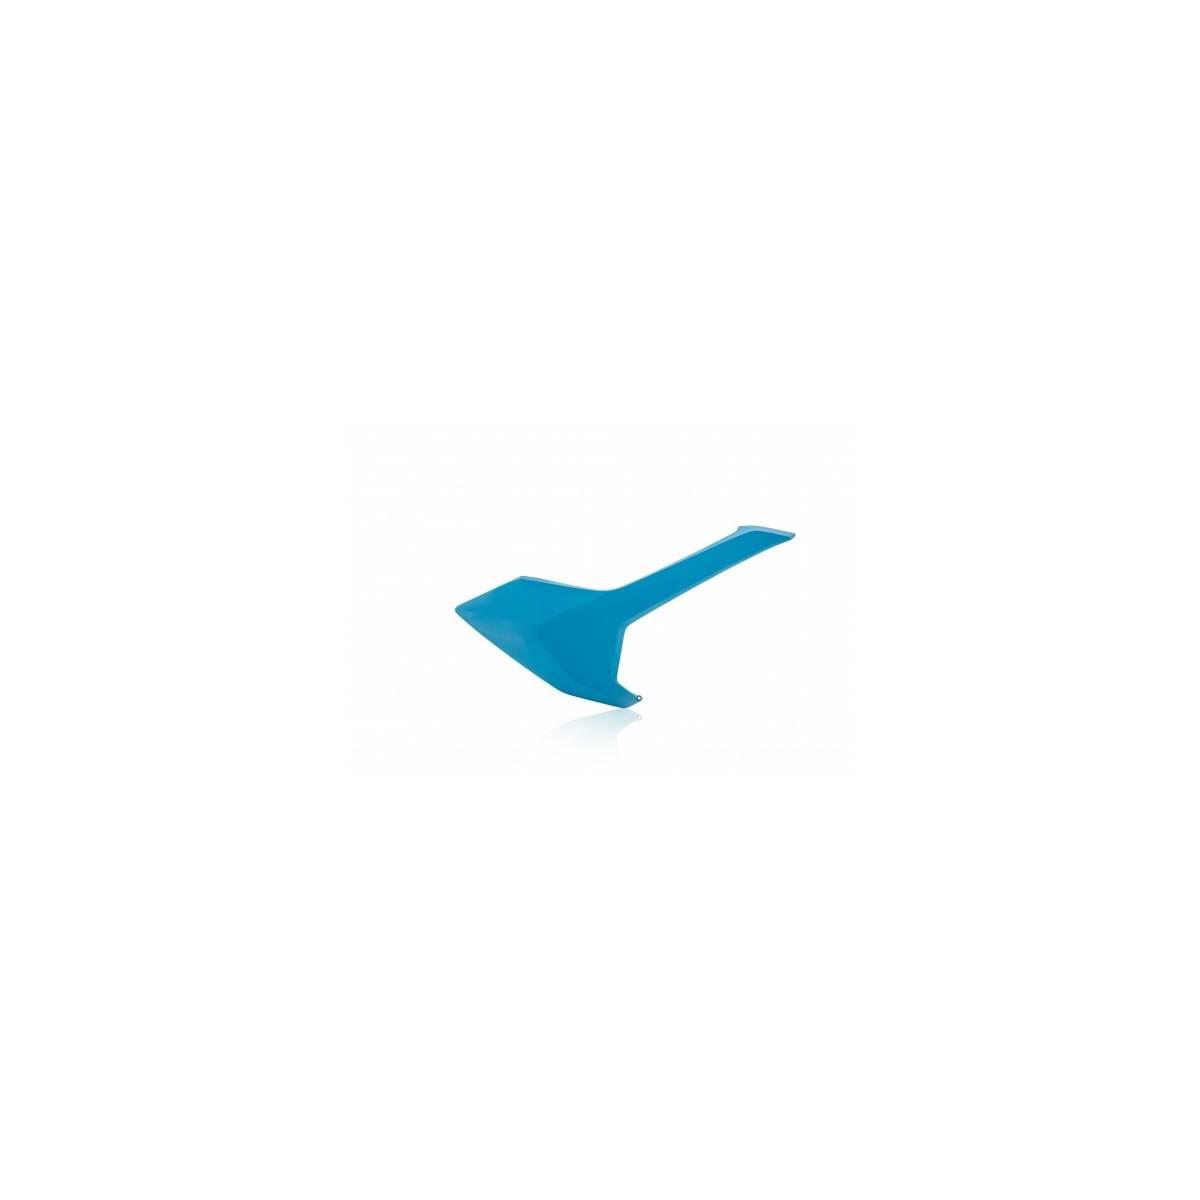 0021828-041 - Aletines Husqvarna Tc Fc 16 (No Tc 250 16) Azul Light